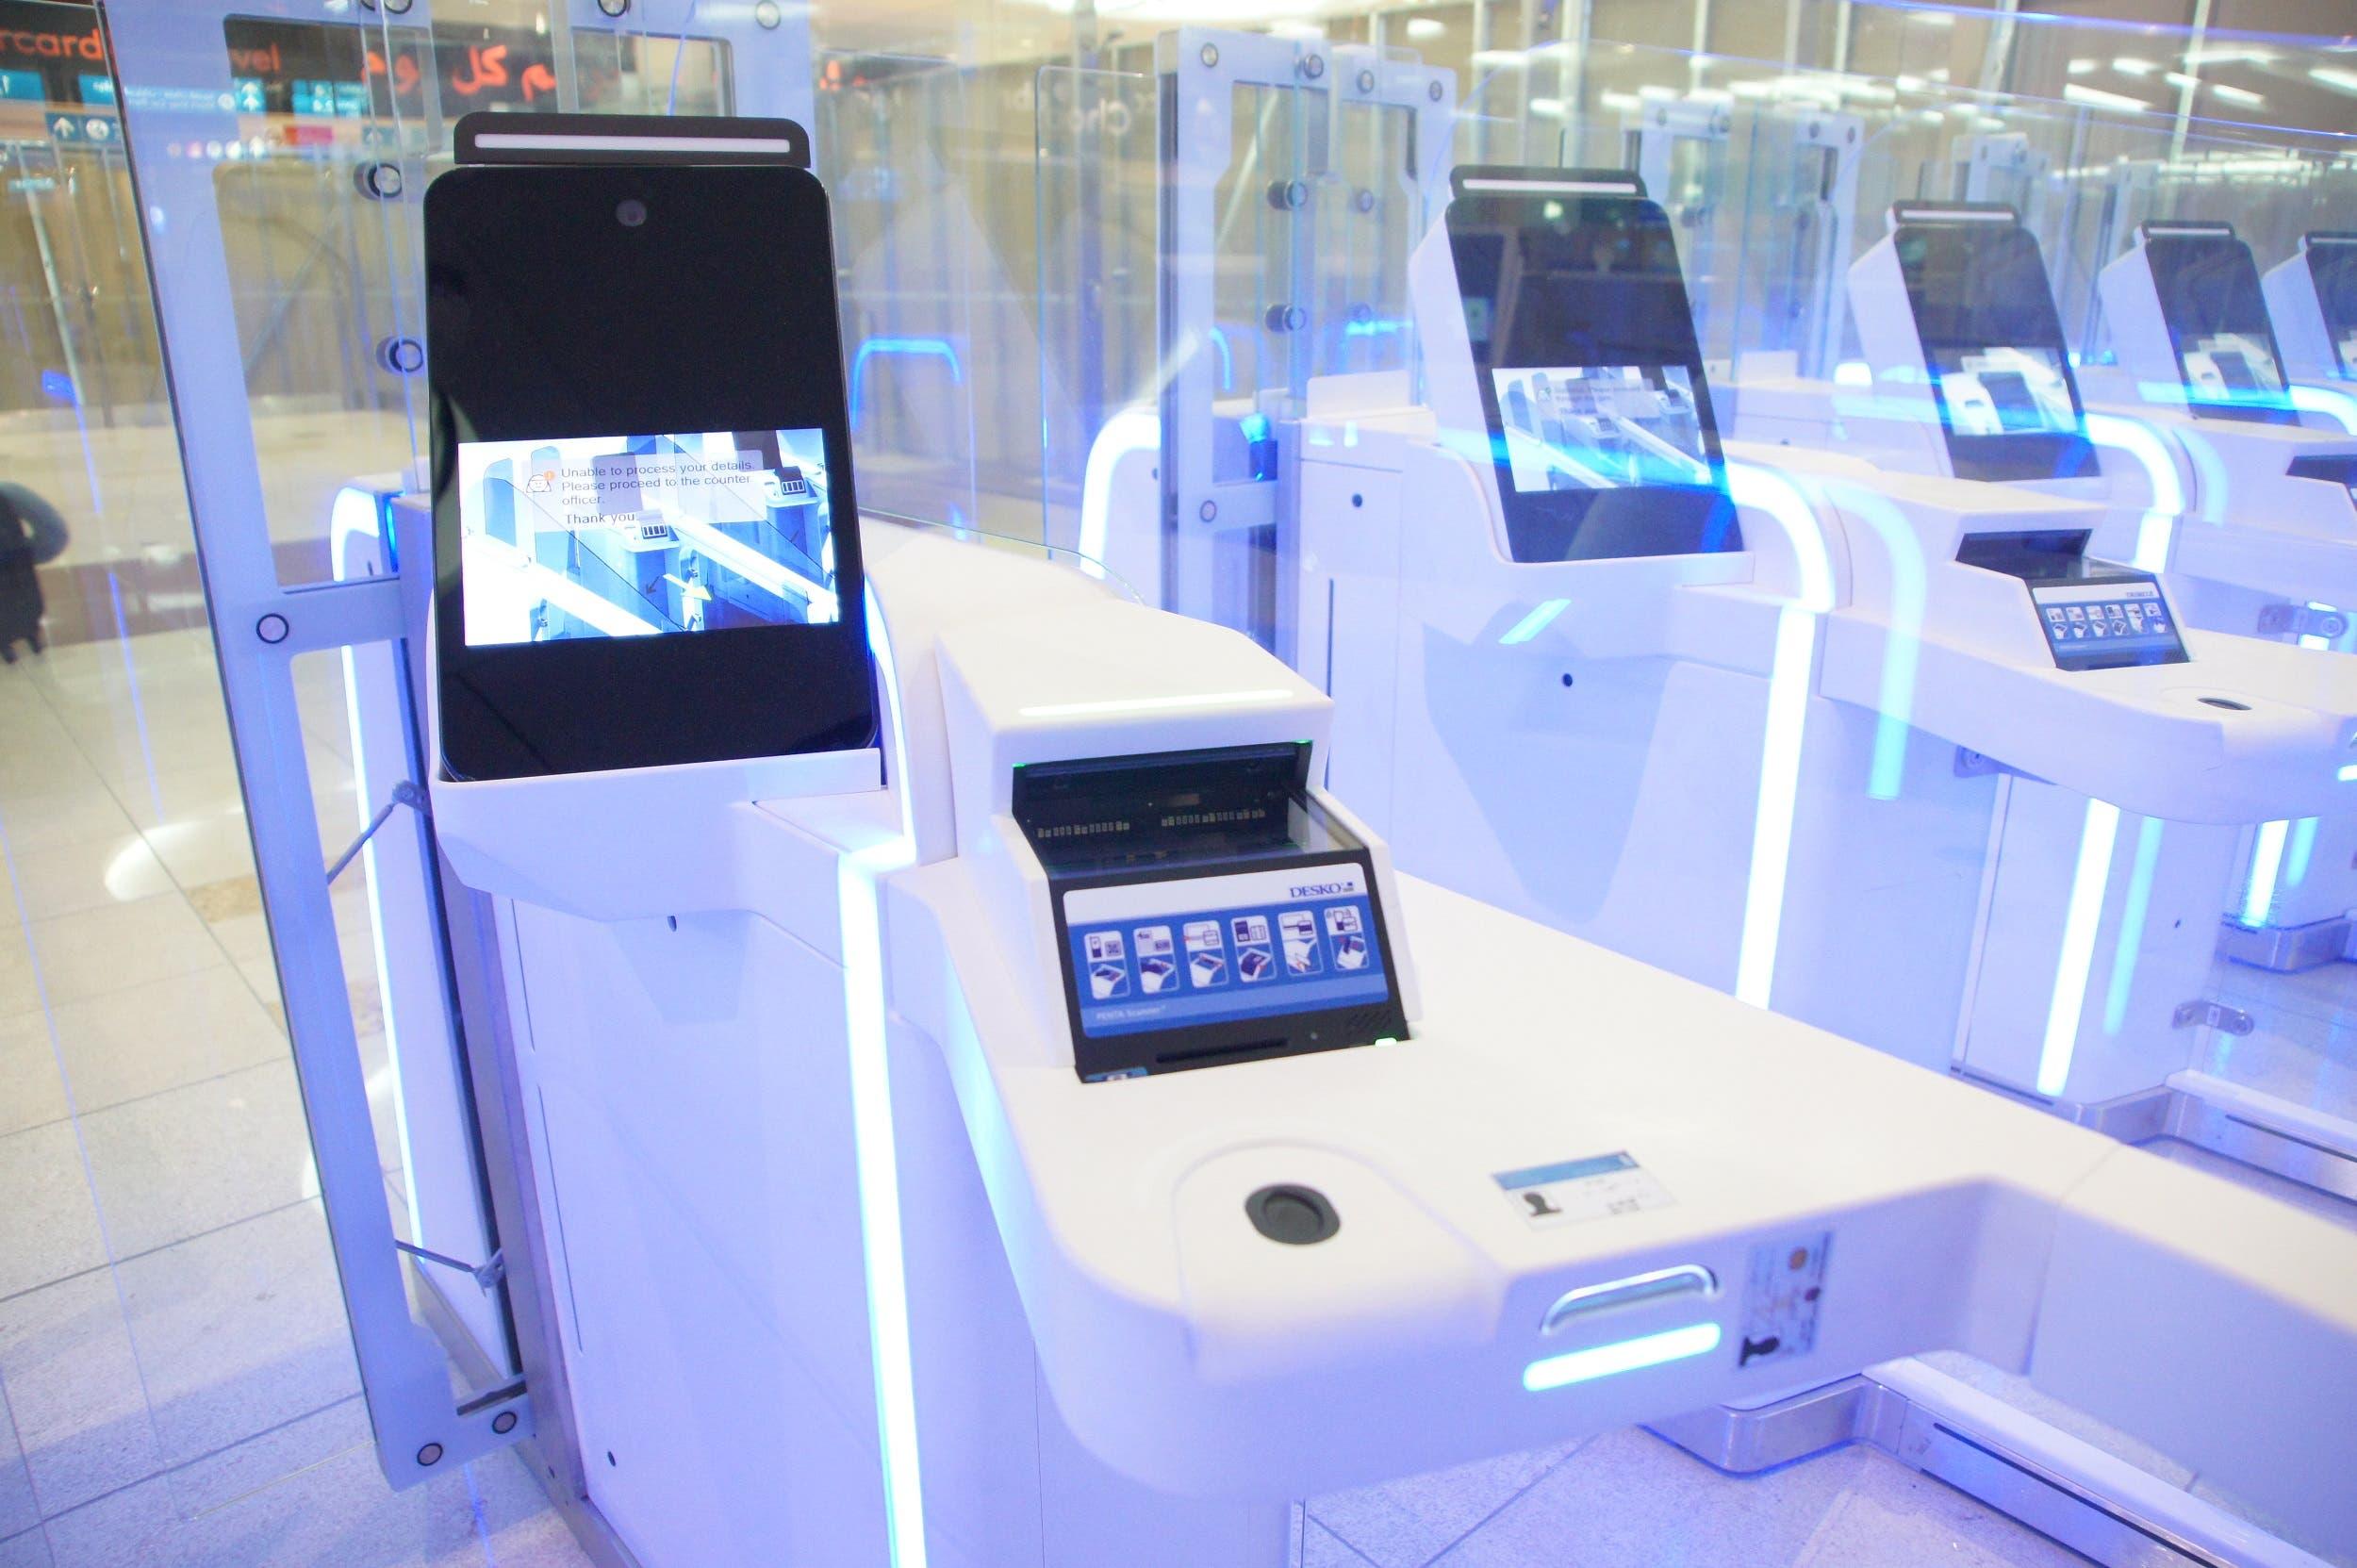 smart gates Dubai 1 (Supplied)